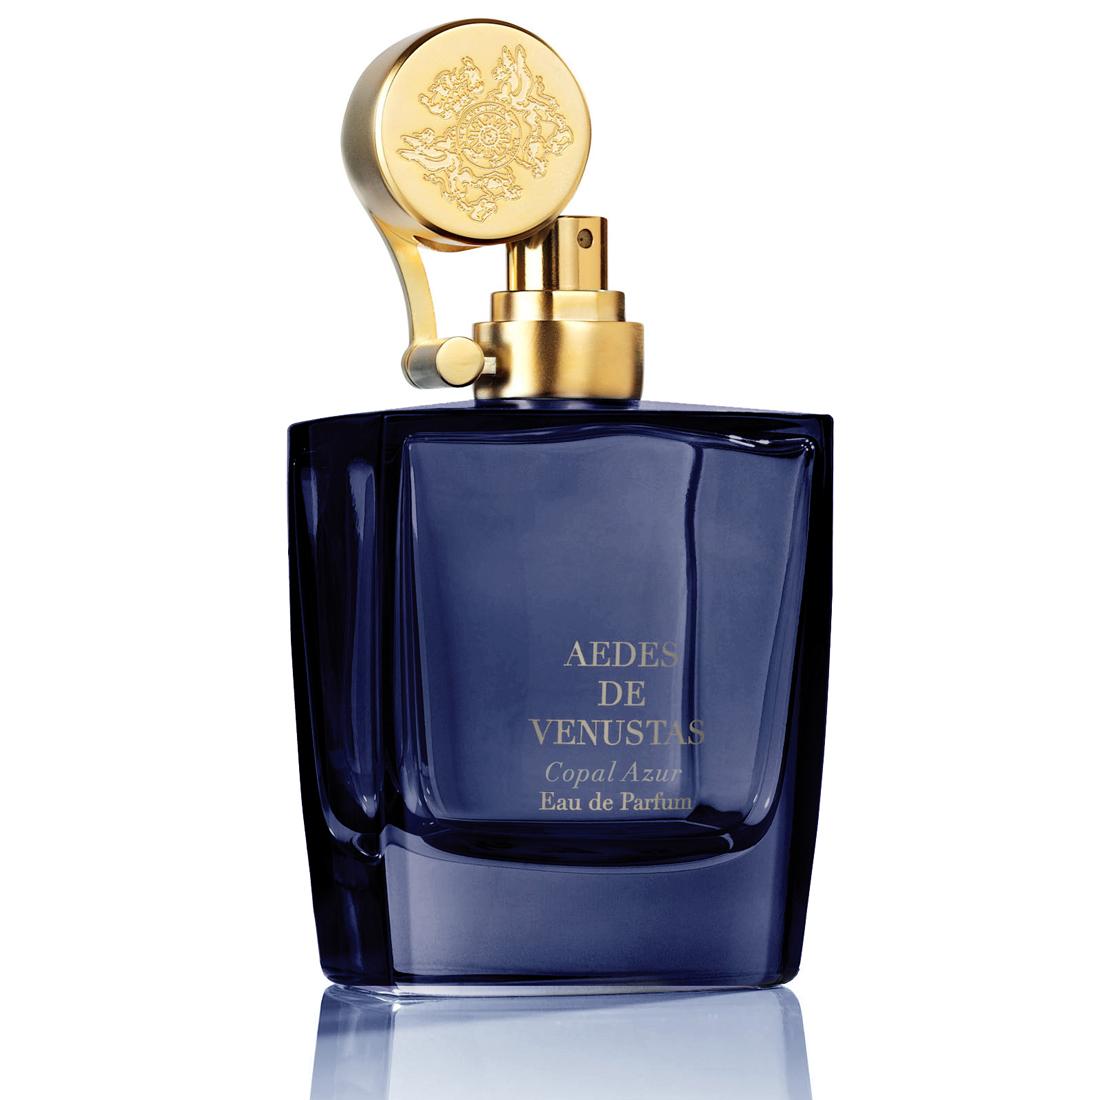 201707_perfume-brand_001